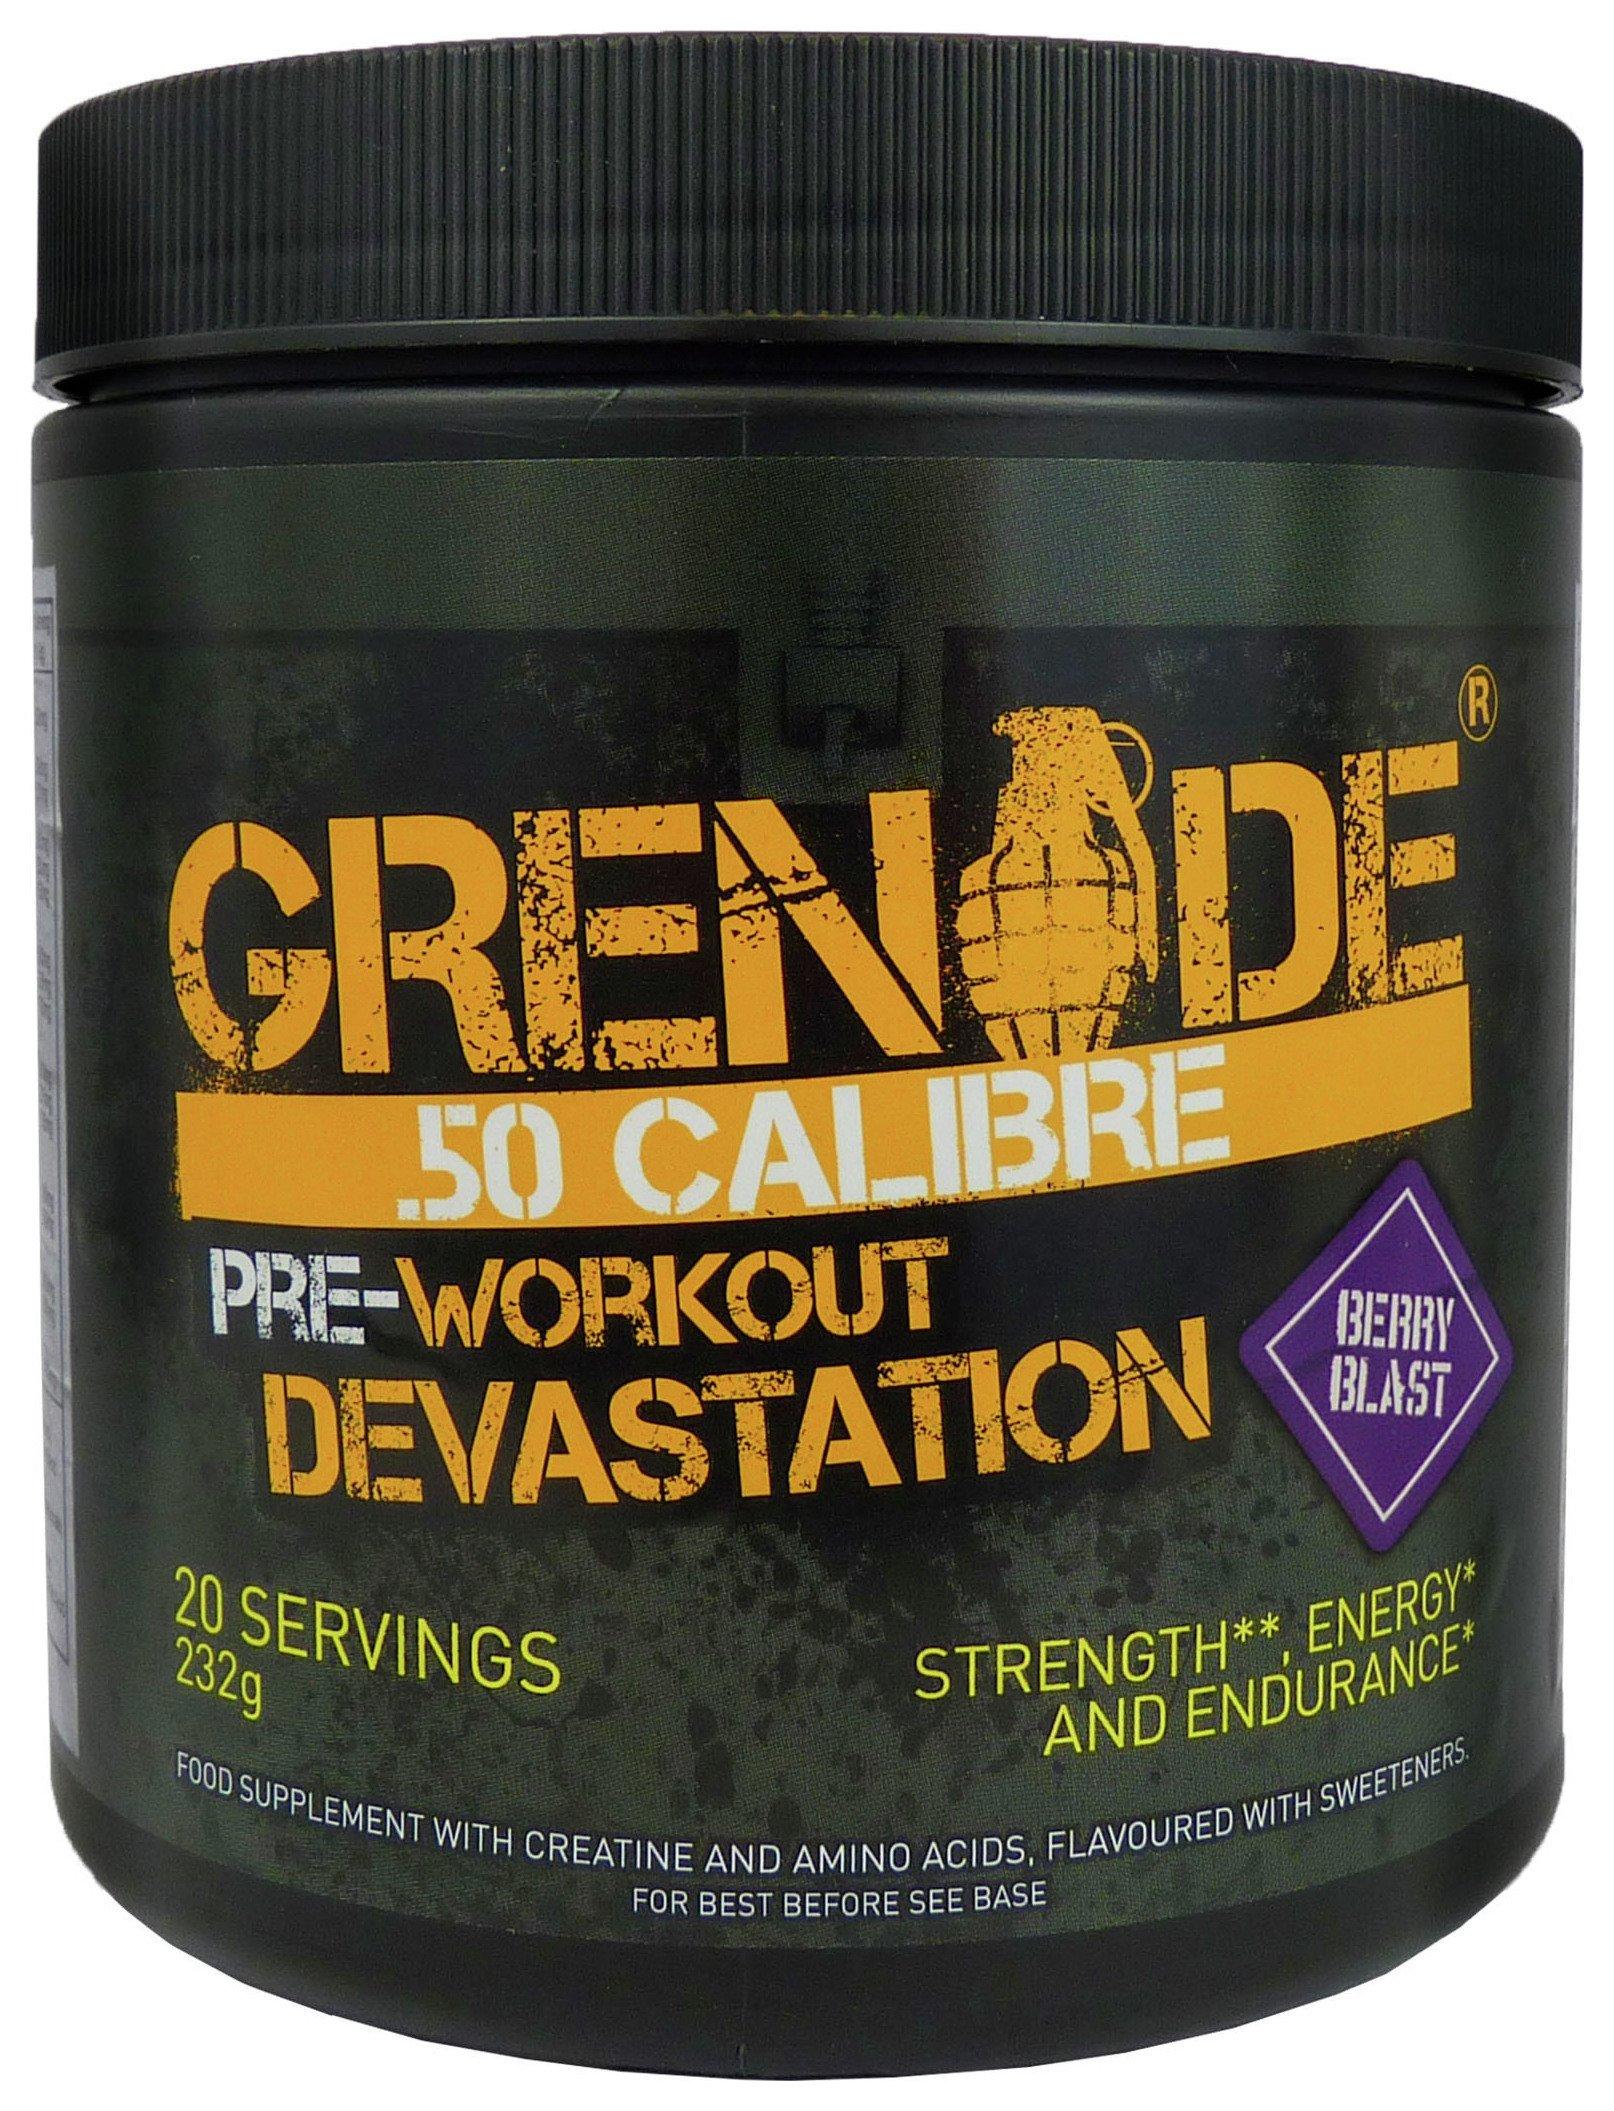 Grenade - 50 Calibre 232g Sports Drink - Berry Blast lowest price